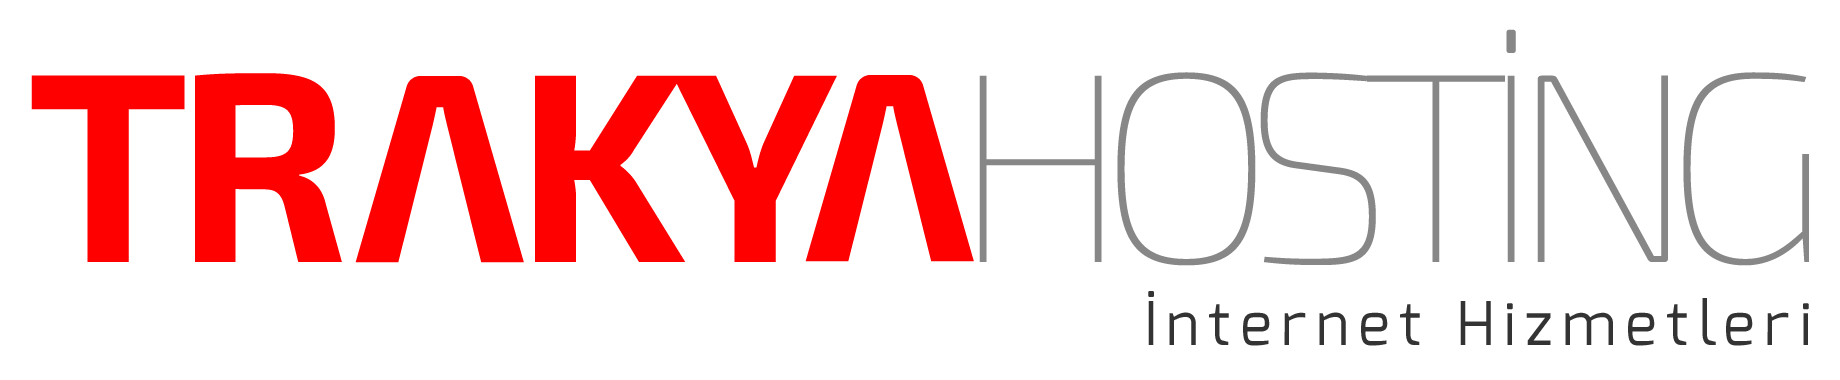 XML Entegrasyonu (Ürün Aktarma) | Trakya Hosting